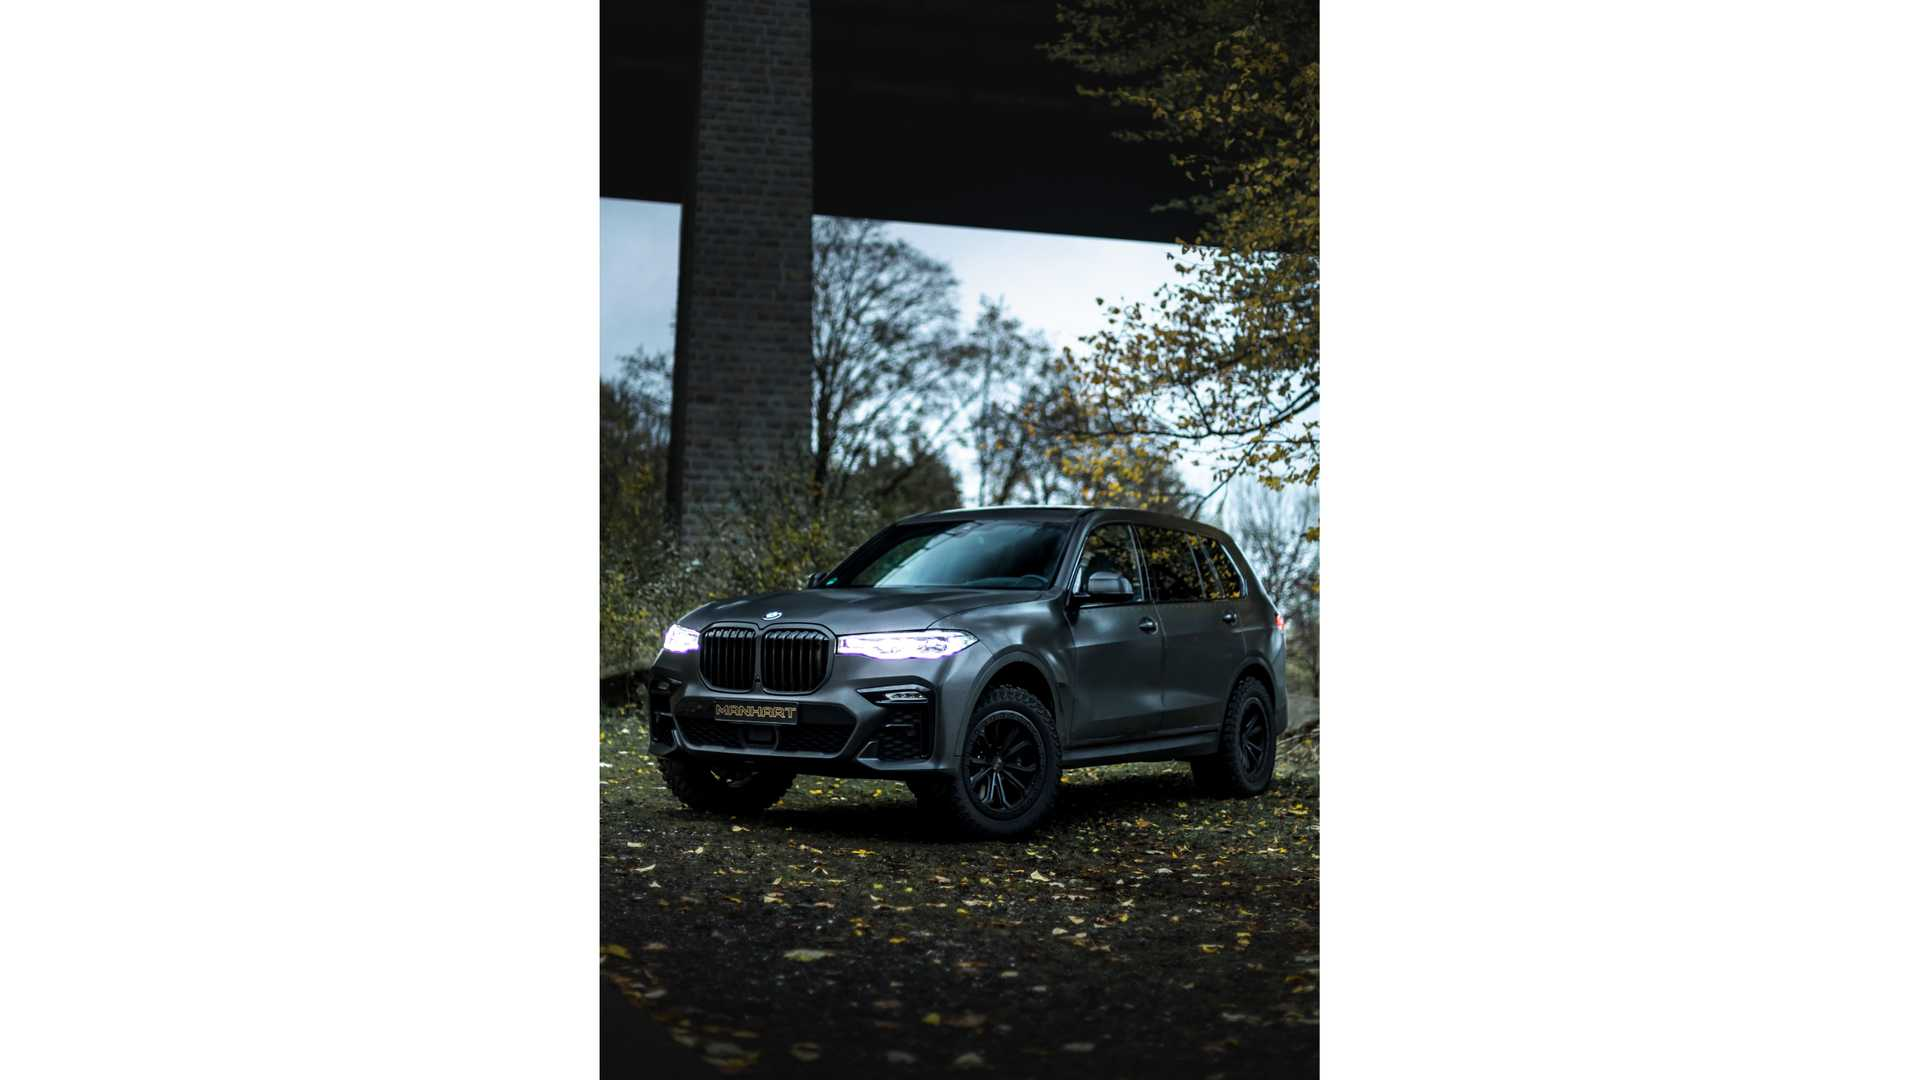 BMW-X7-Dirt-Edition-By-Manhart-6